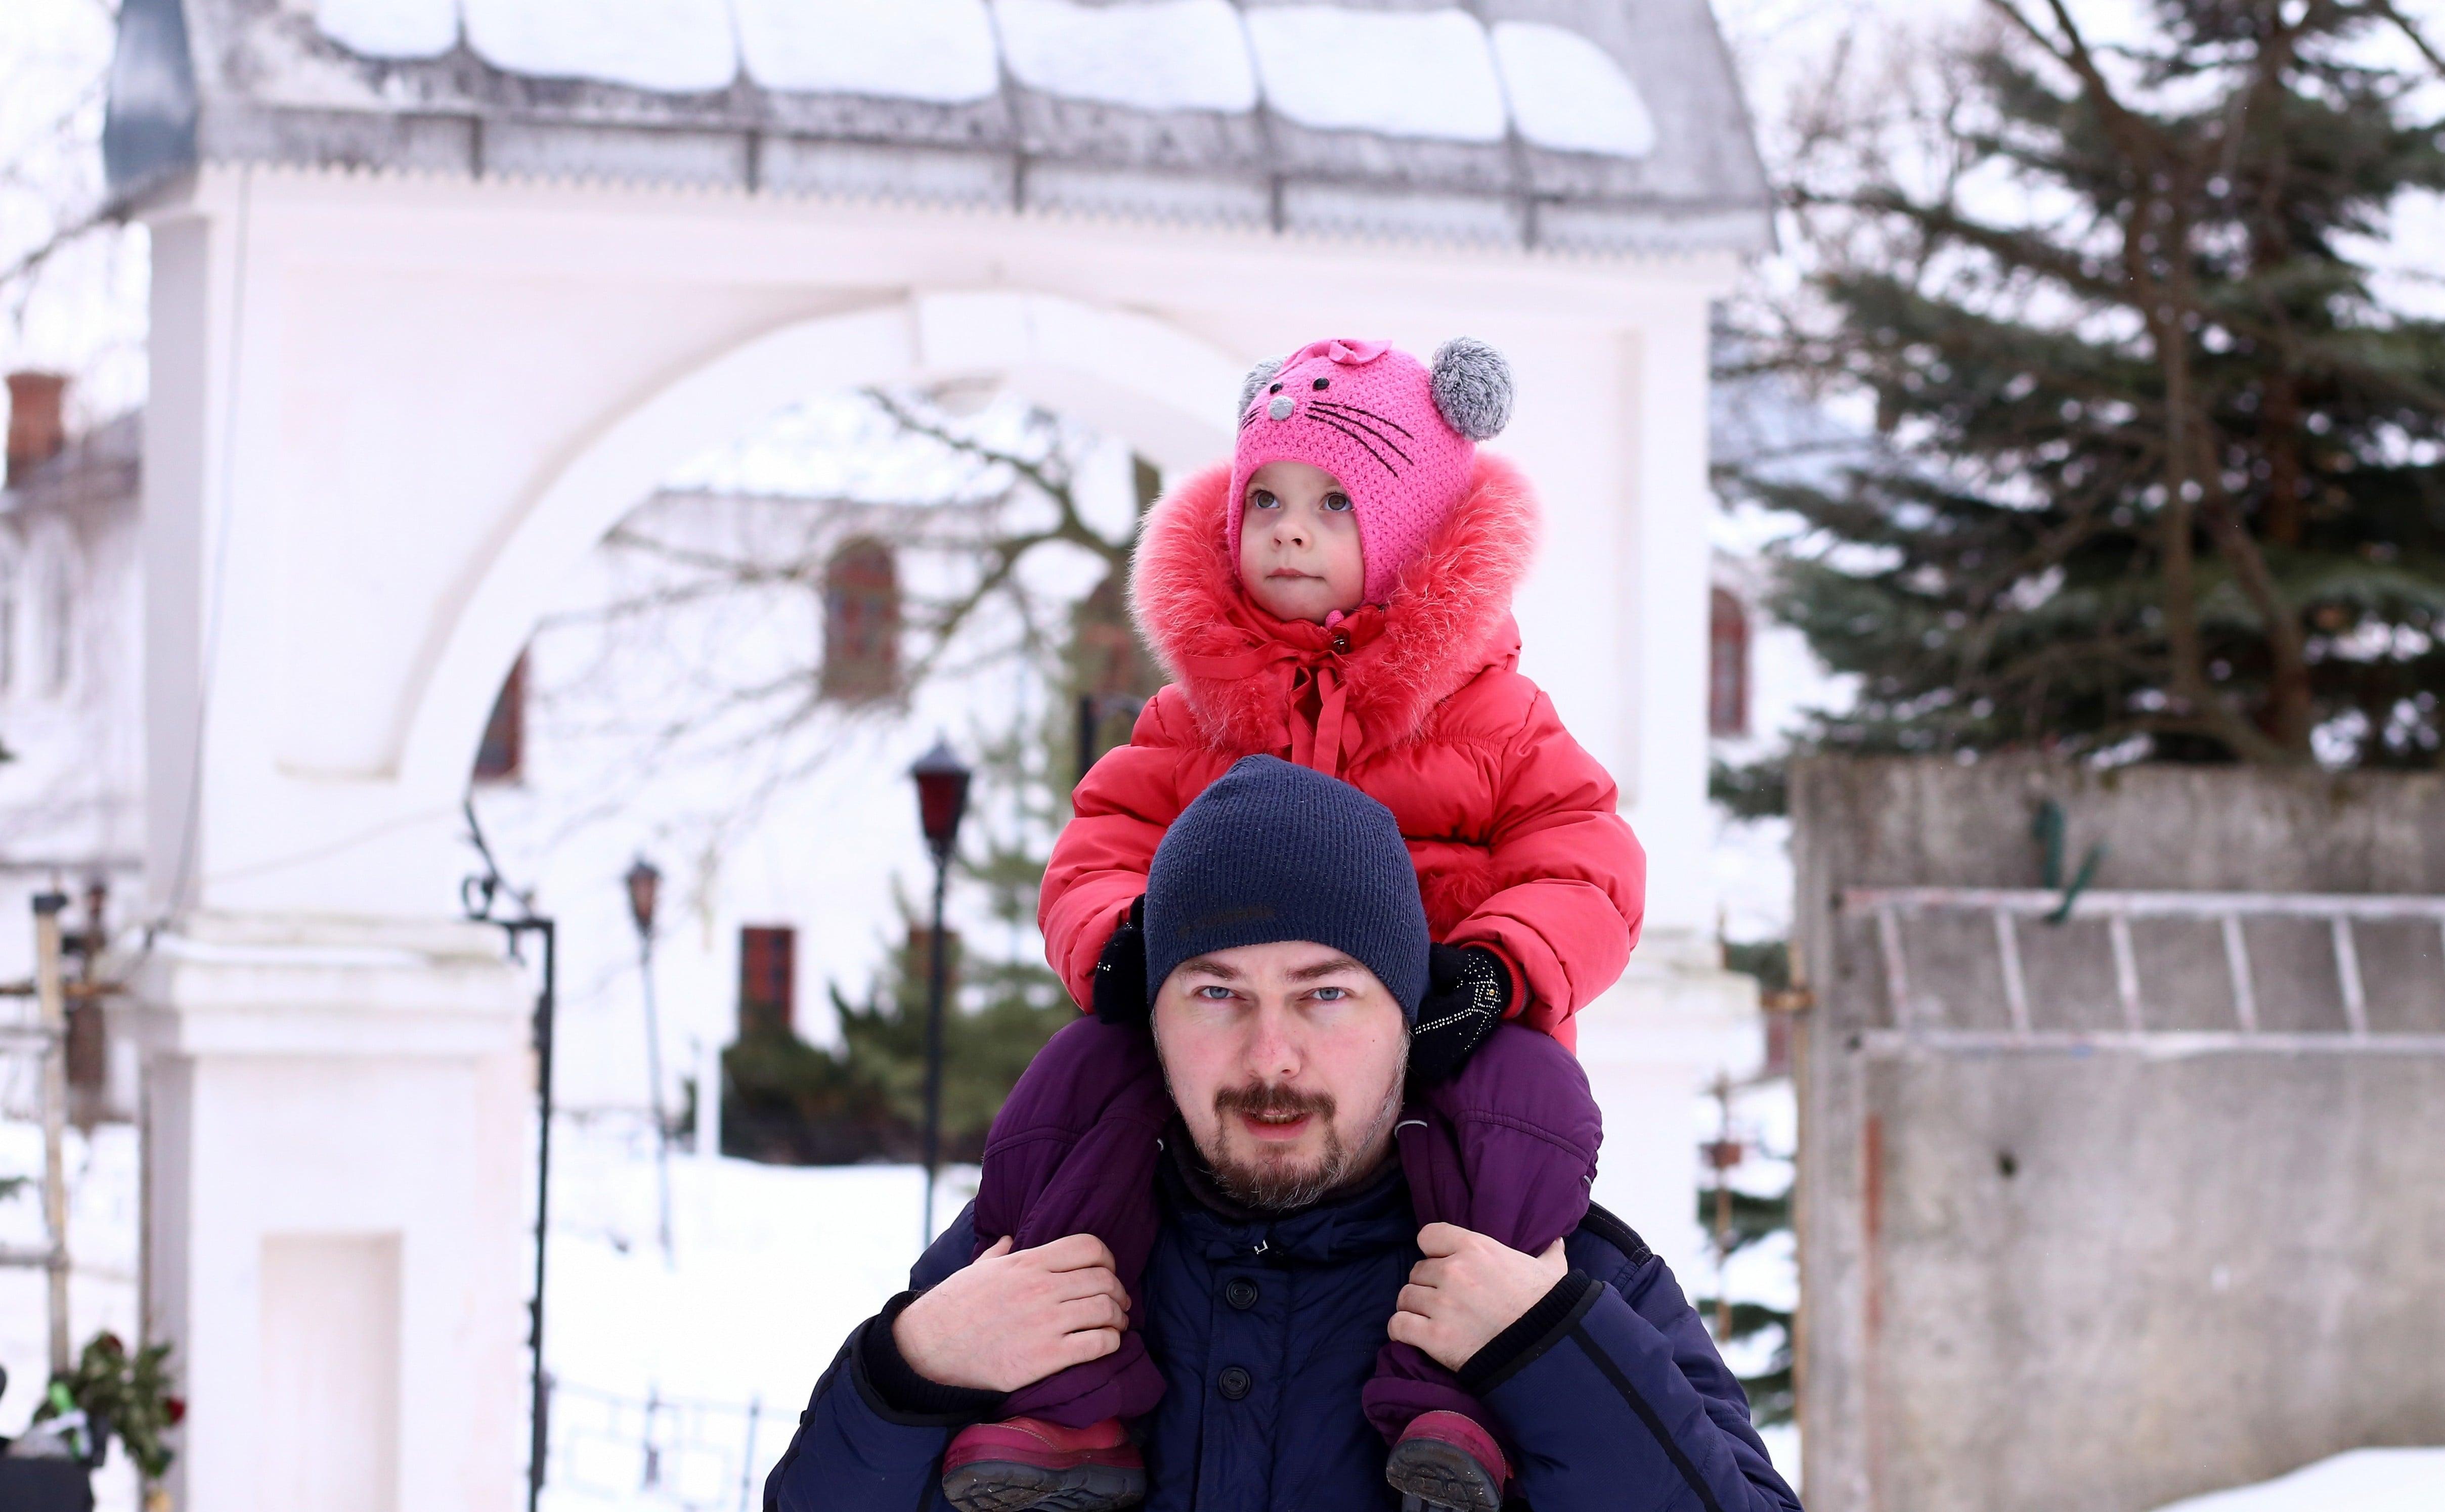 http://monuspen.ru/photoreports/533441fe5442a87d10ca79acbd863e78.jpg